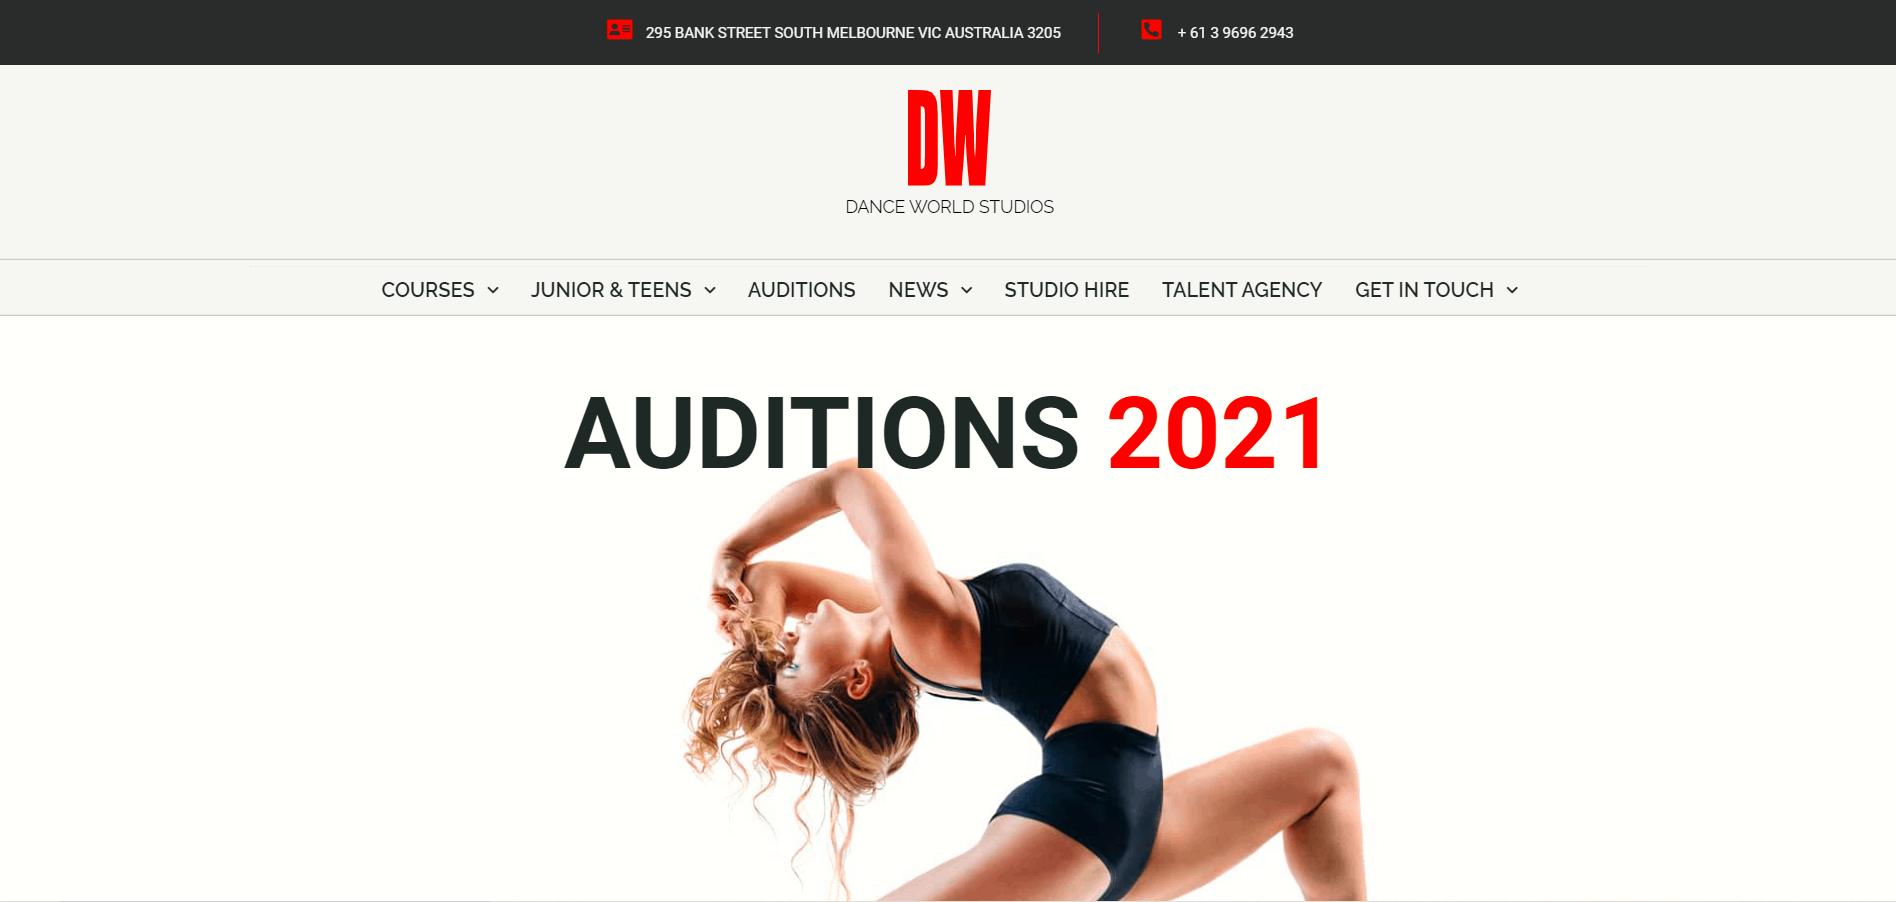 Dance World Studios